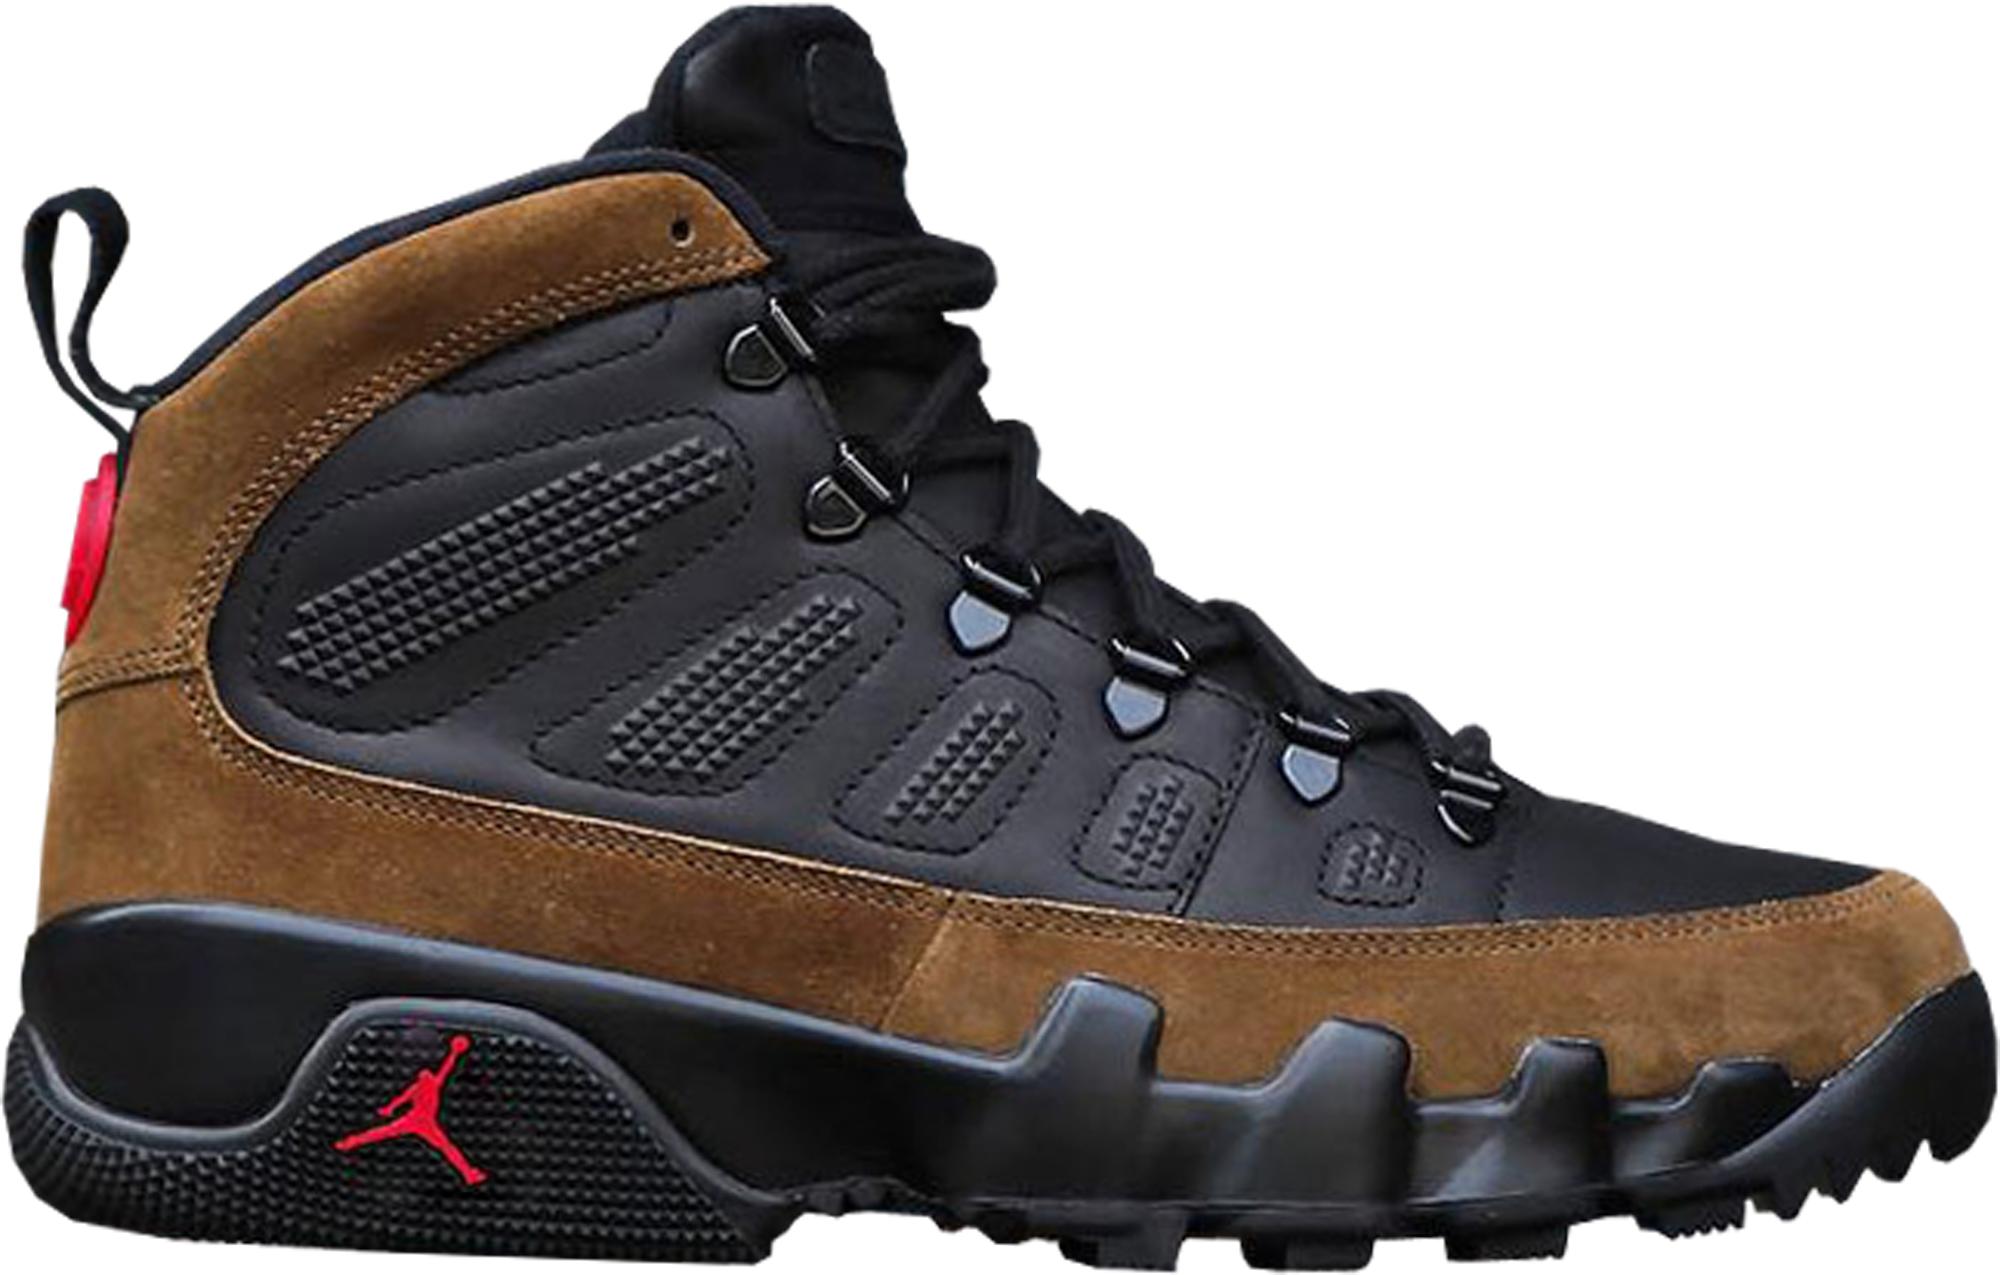 Air Jordan 9 Retro Boot Olive - StockX News